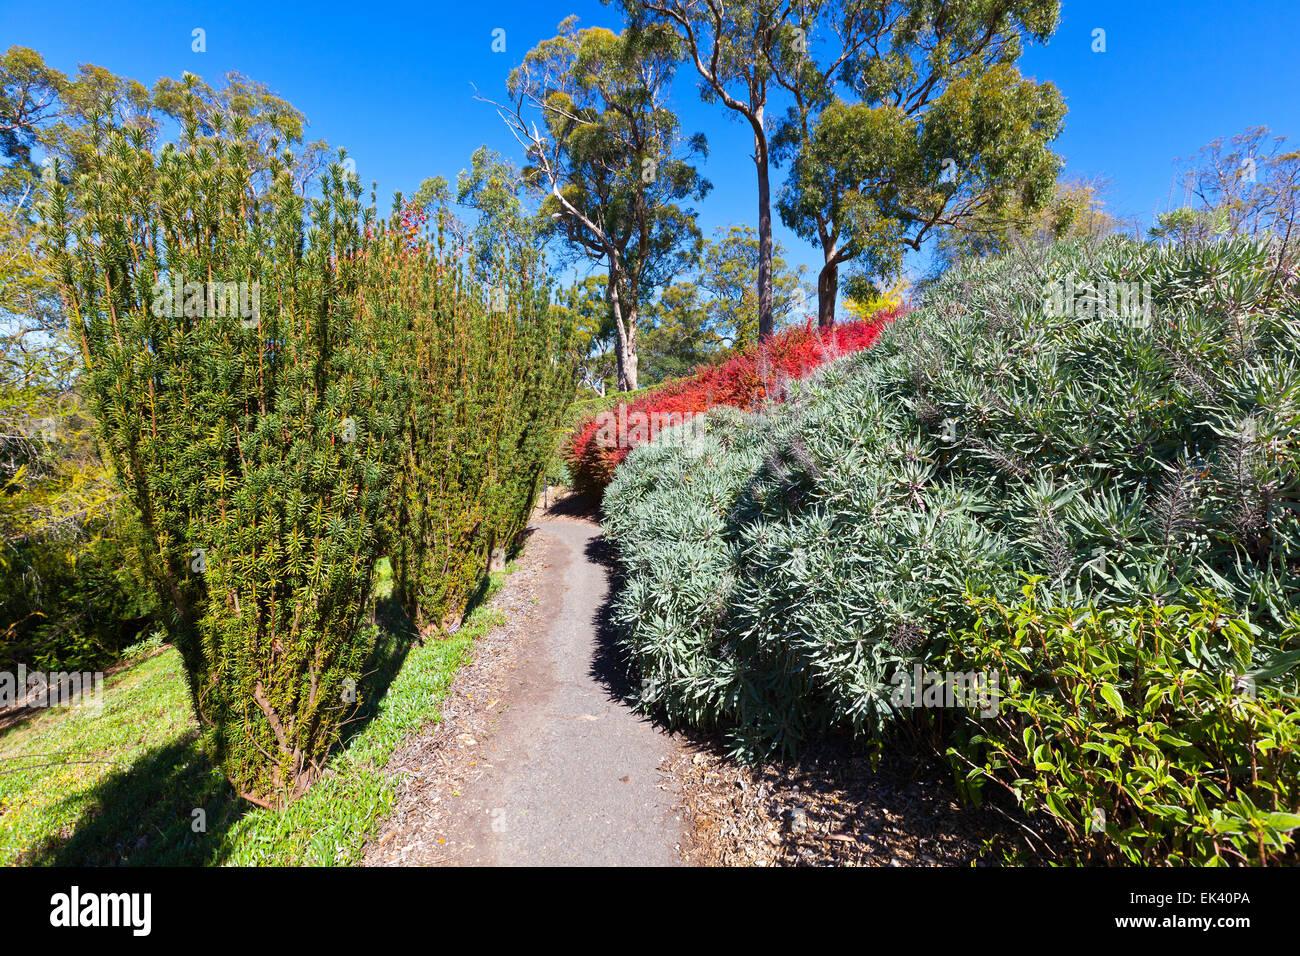 Mt Lofty Botanical Gardens Adelaide Hills South Australia Australian landscape landscapes autumn tourist attraction - Stock Image